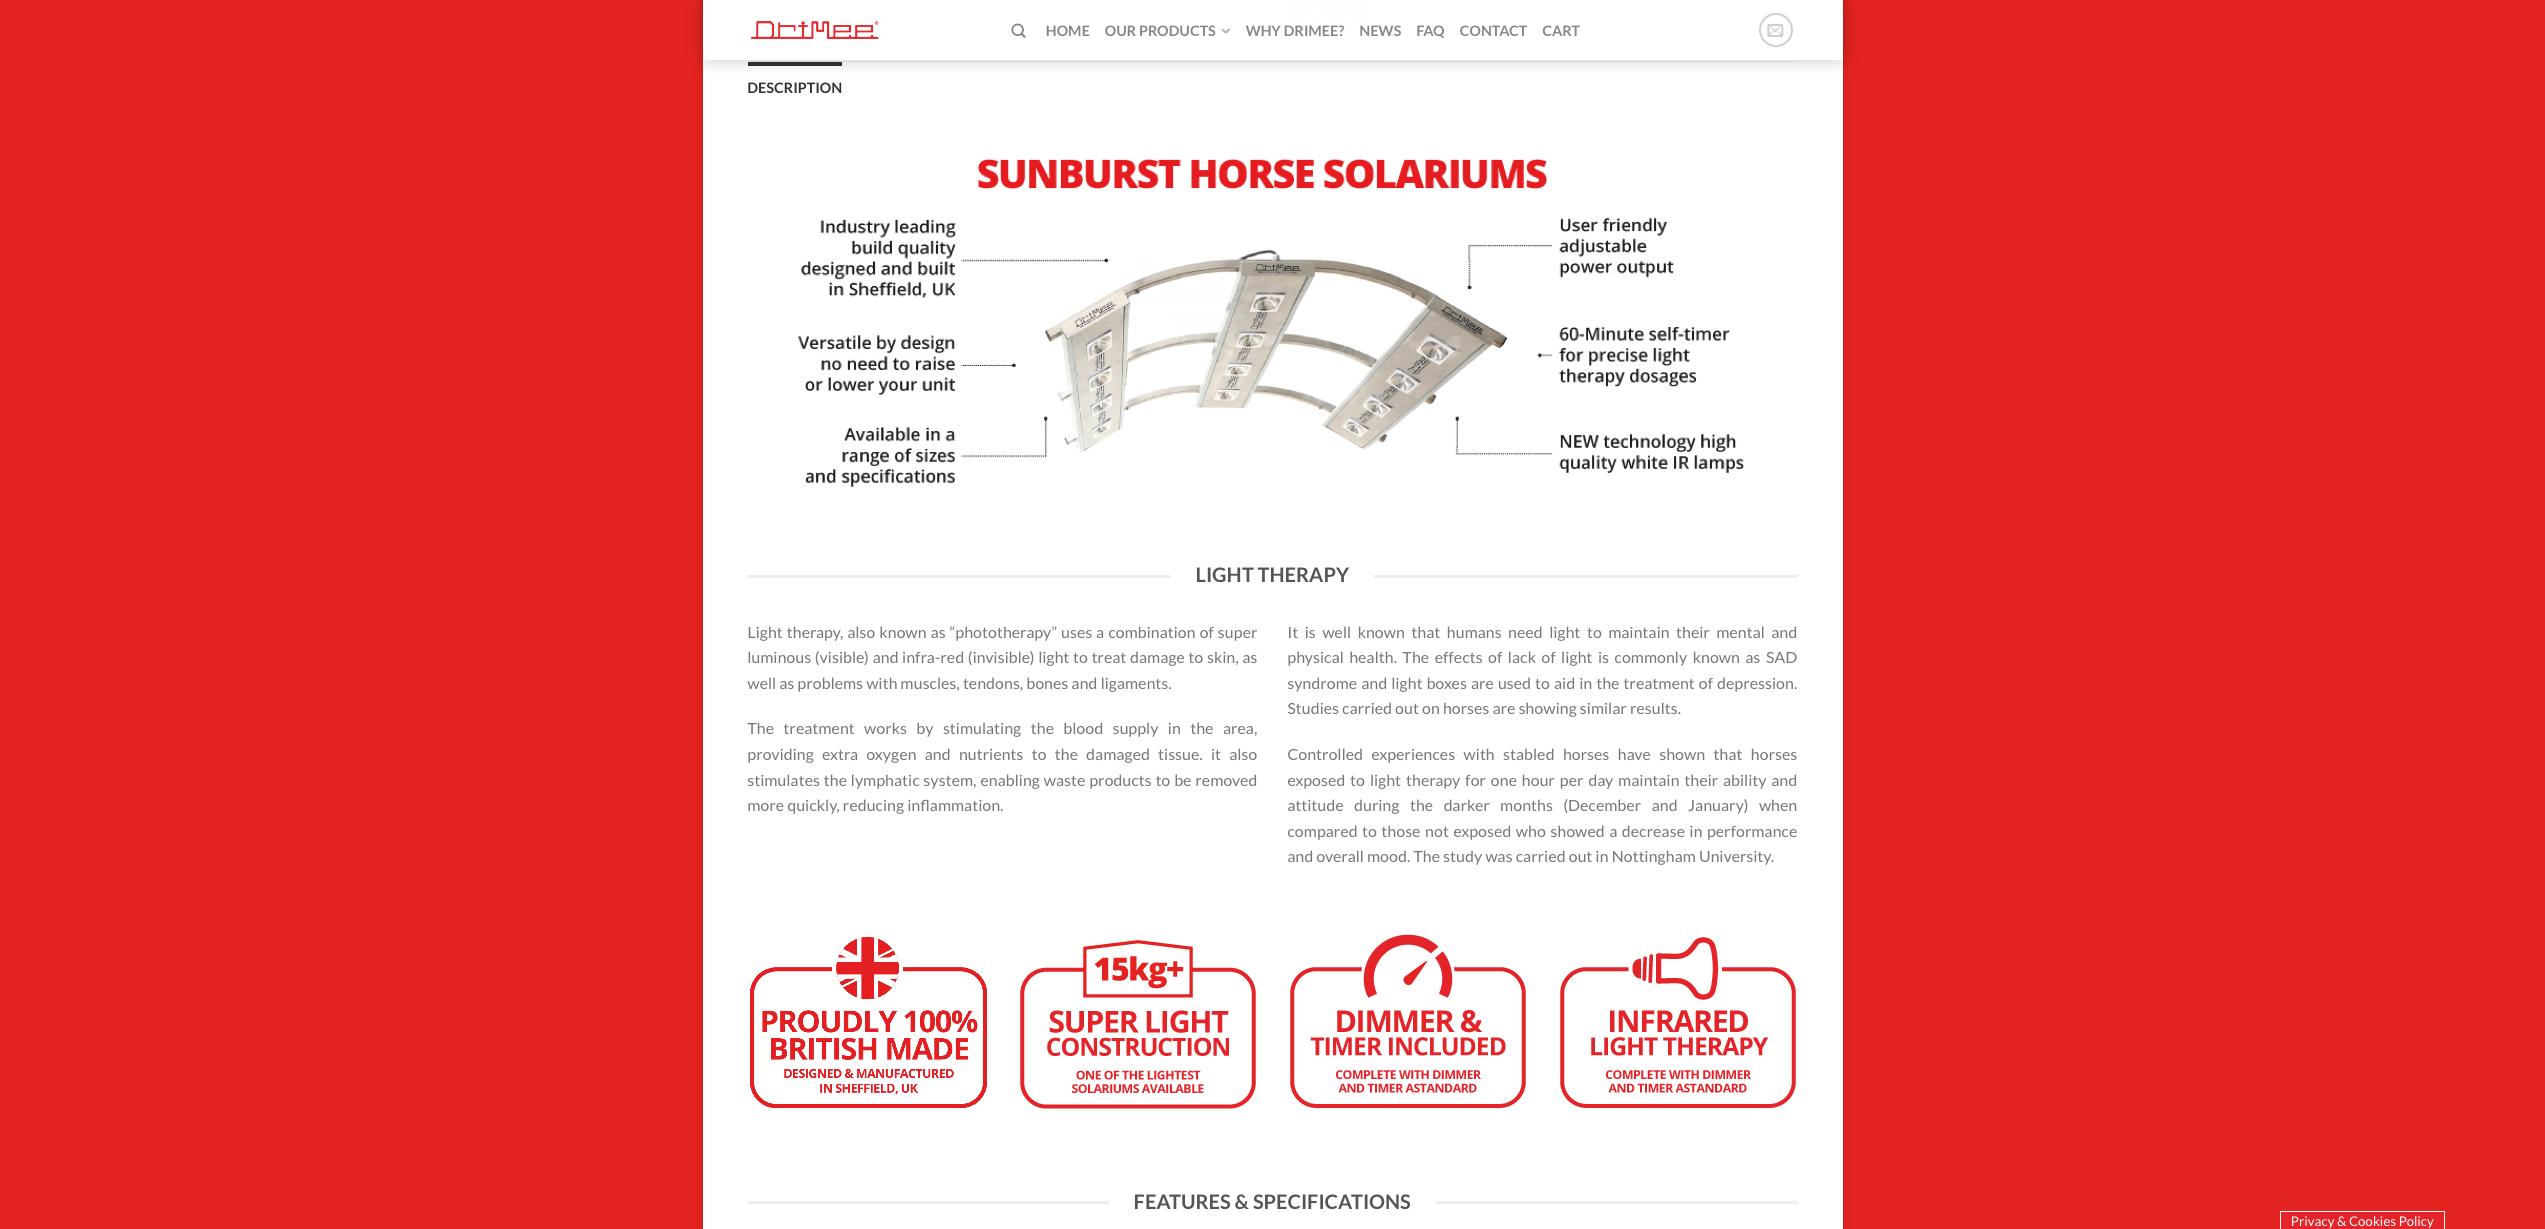 IDEA UK Design and Marketing Drimee Equestrian Horse Equipment Website Design 8